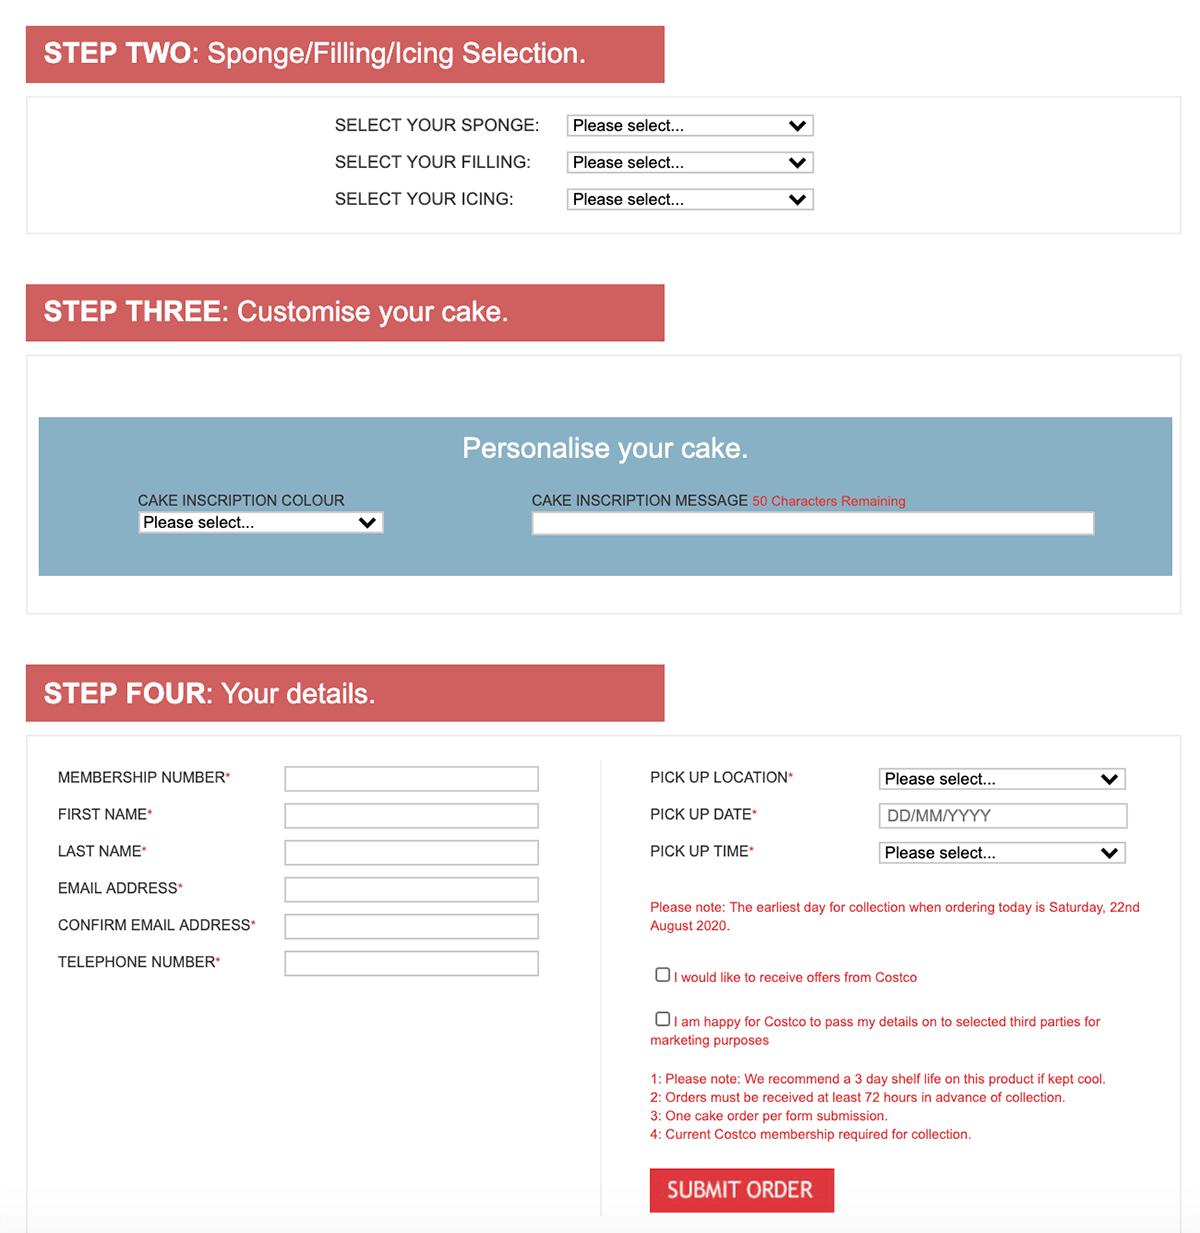 Costco Online Cake Order Form